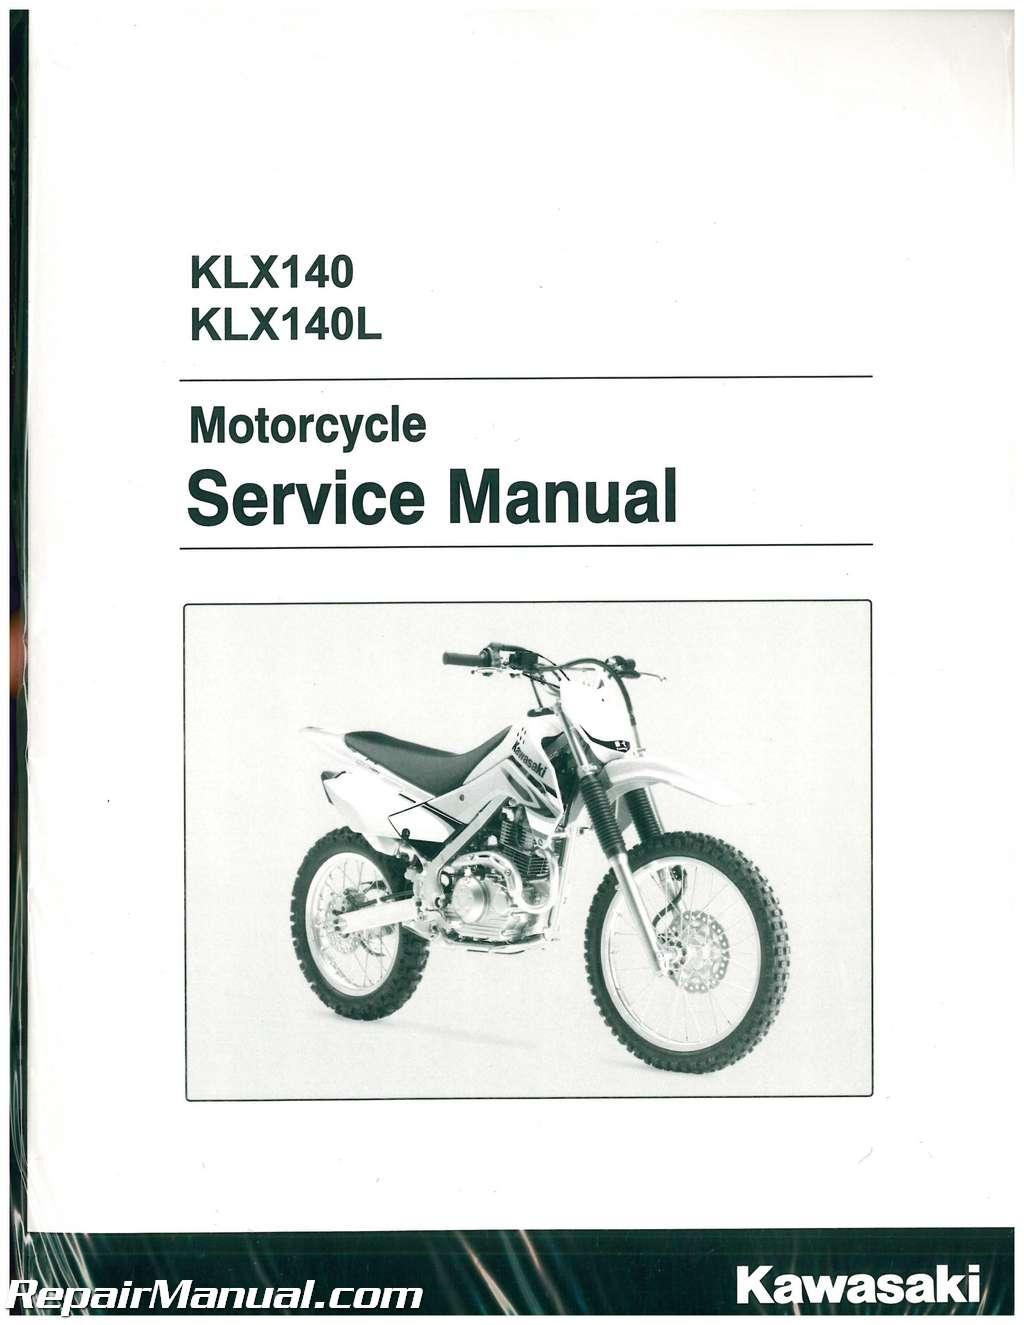 kawasaki klx 140 service manual